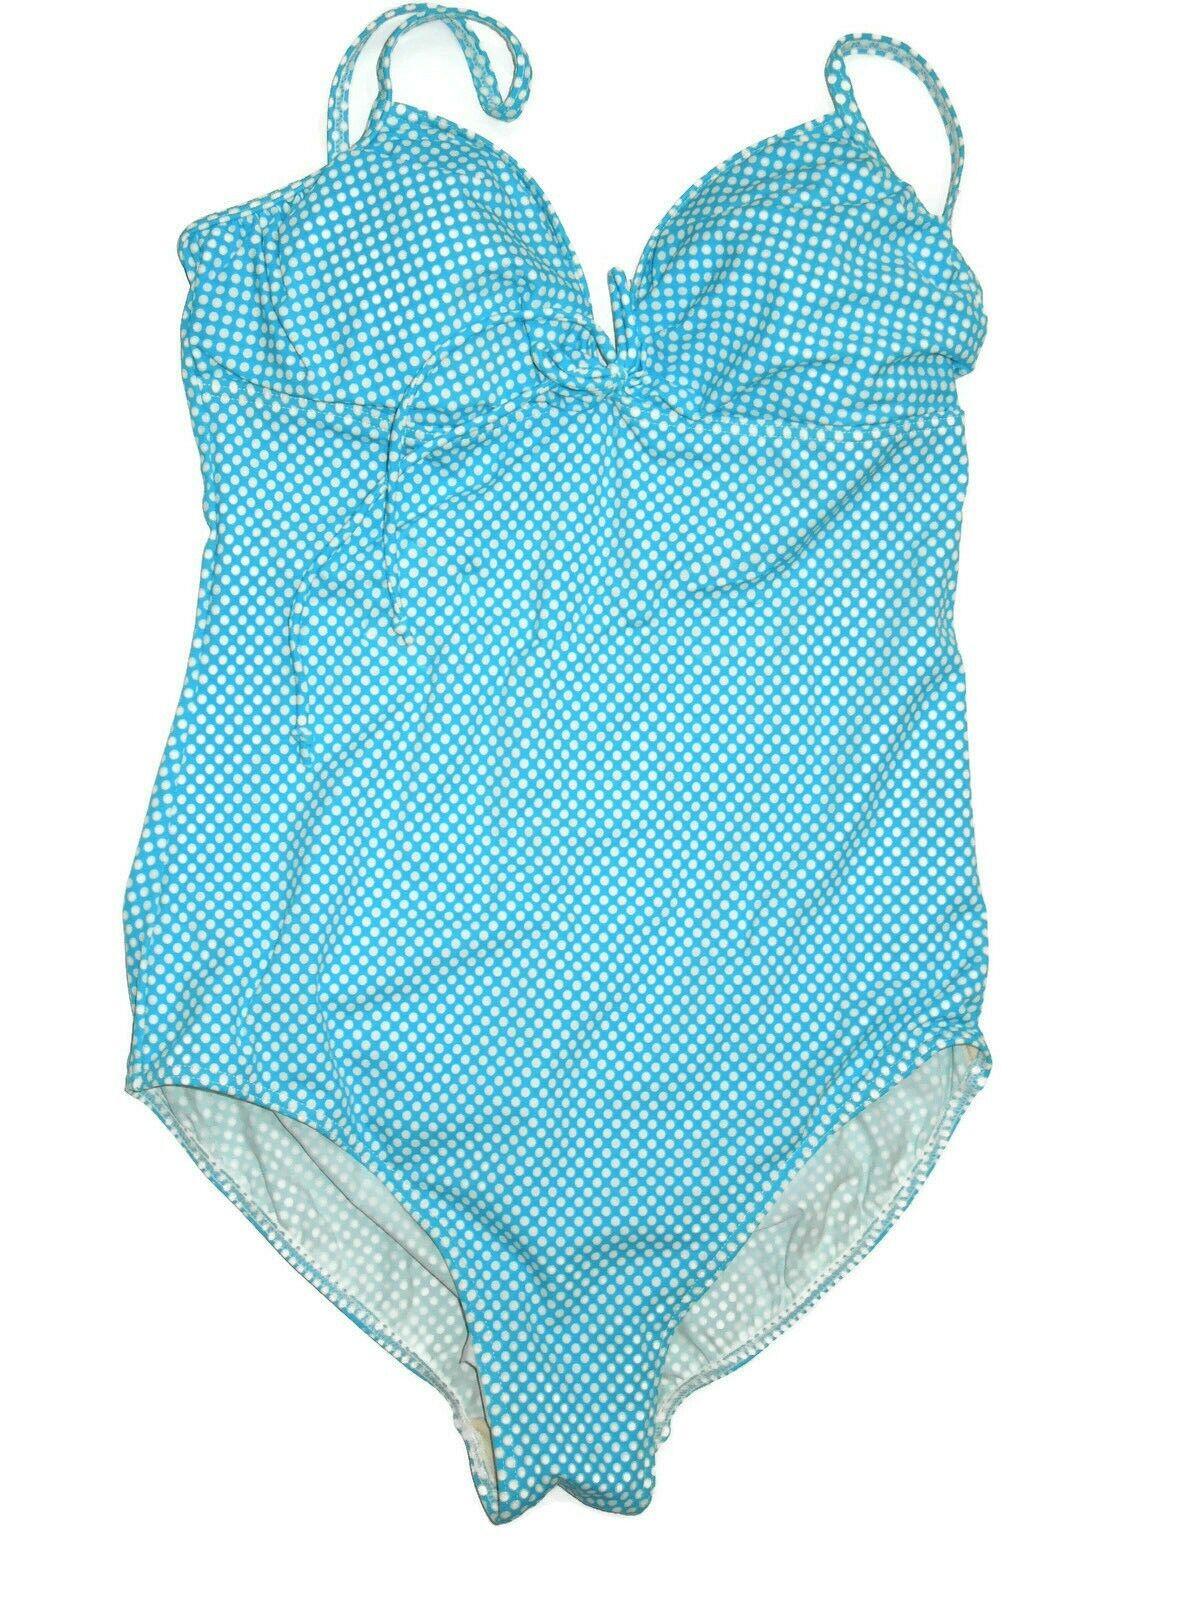 It Figures  one piece Aqua bluee polka dot print slimming Swimsuit size 14